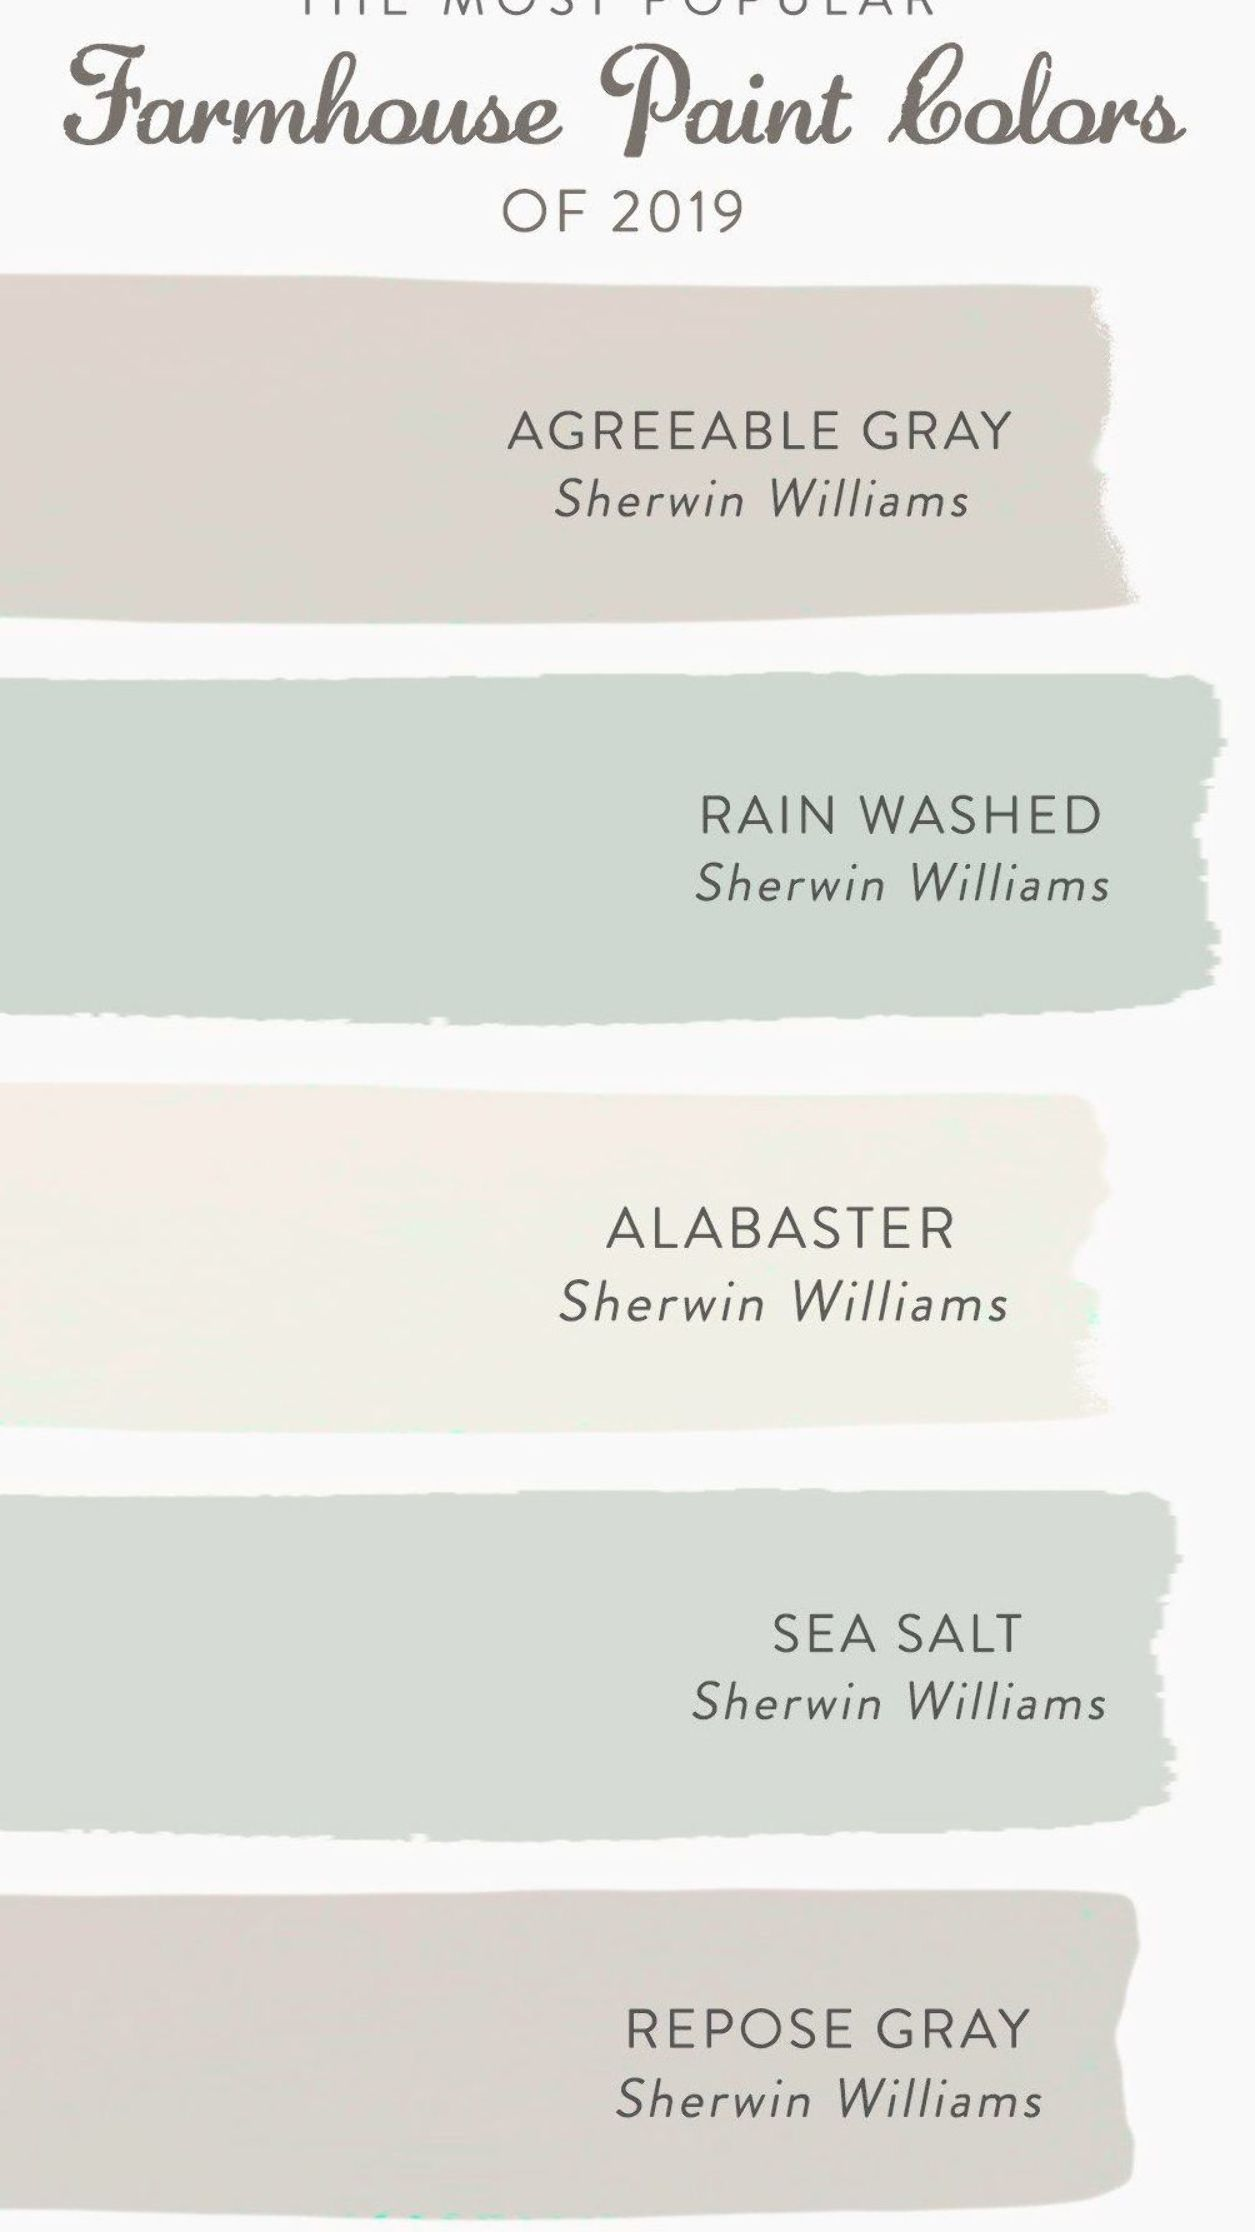 The Most Popular Farmhouse Paint Colors Of 2019 Decor Steals Blog Farmhouse Paint Farmhouse Paint Colors Farm House Colors